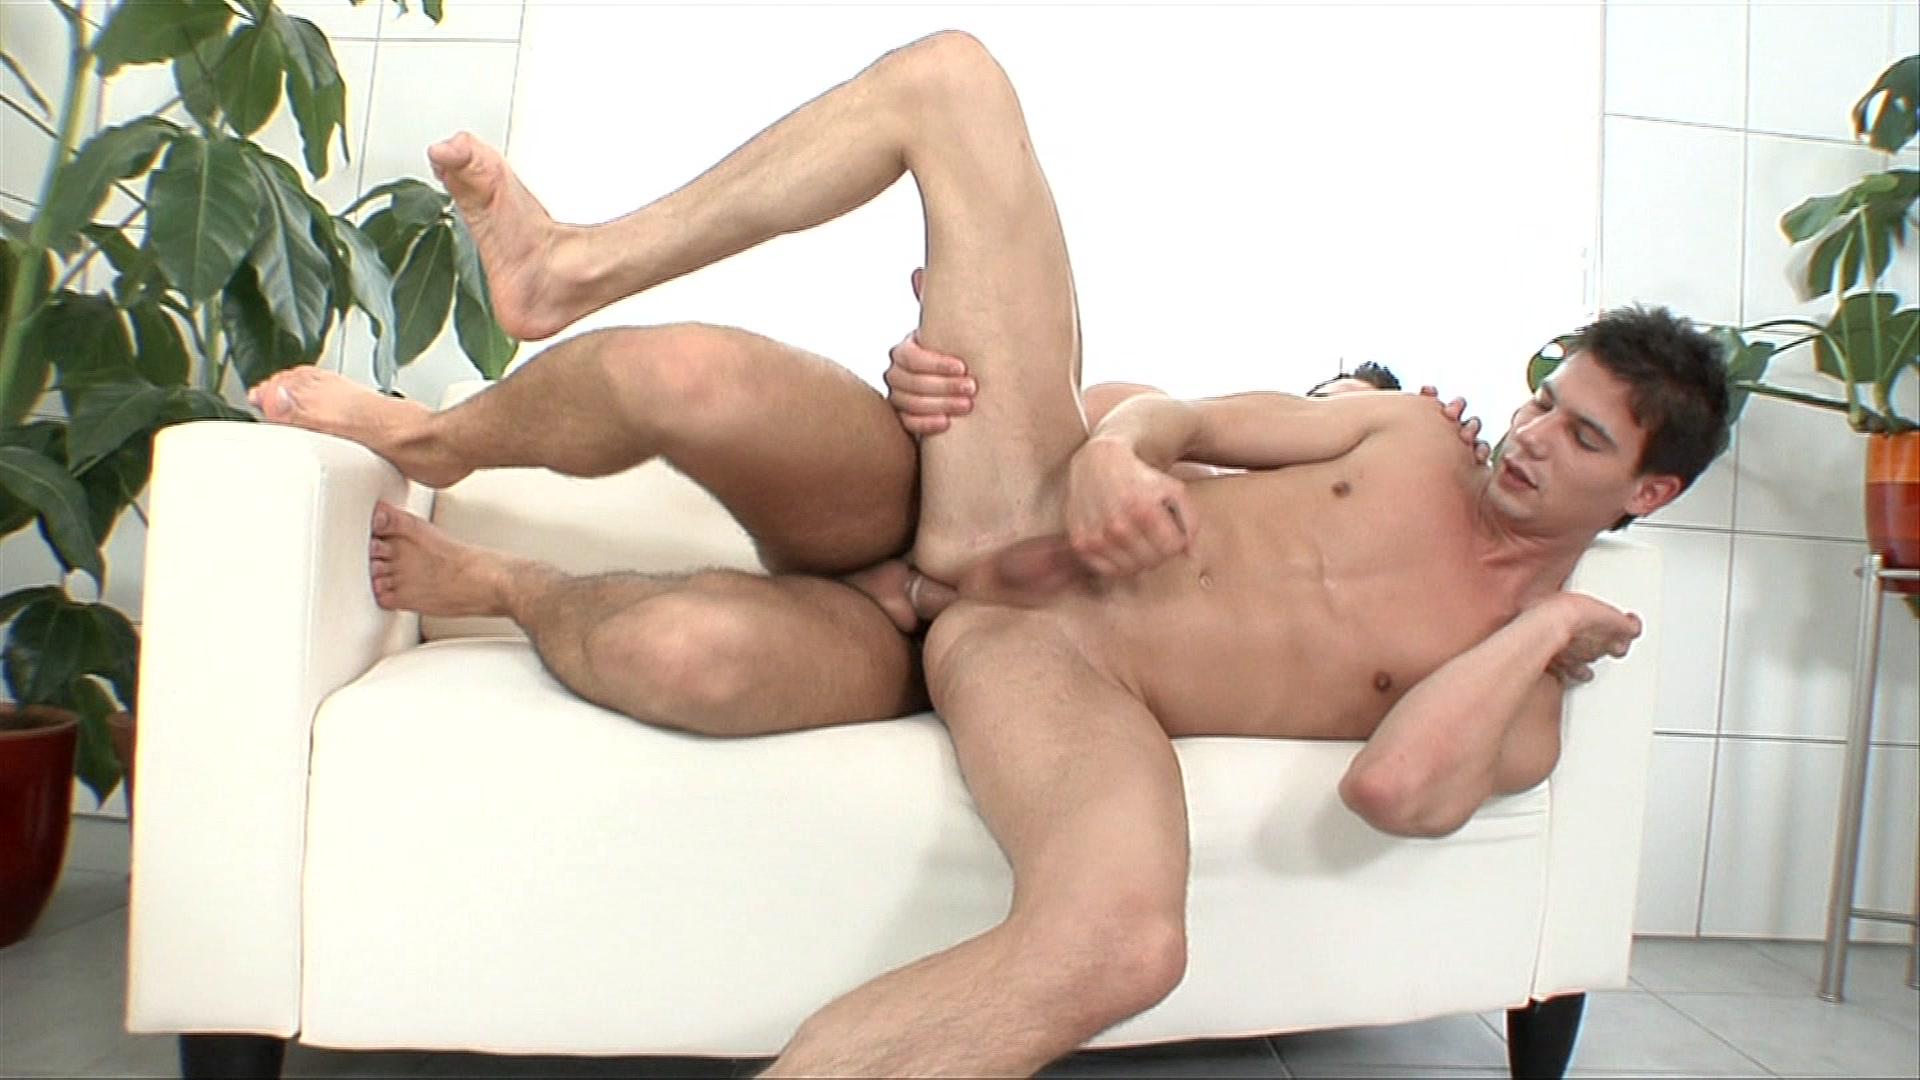 Fresh Twink Olesik - Gay Video On Demand